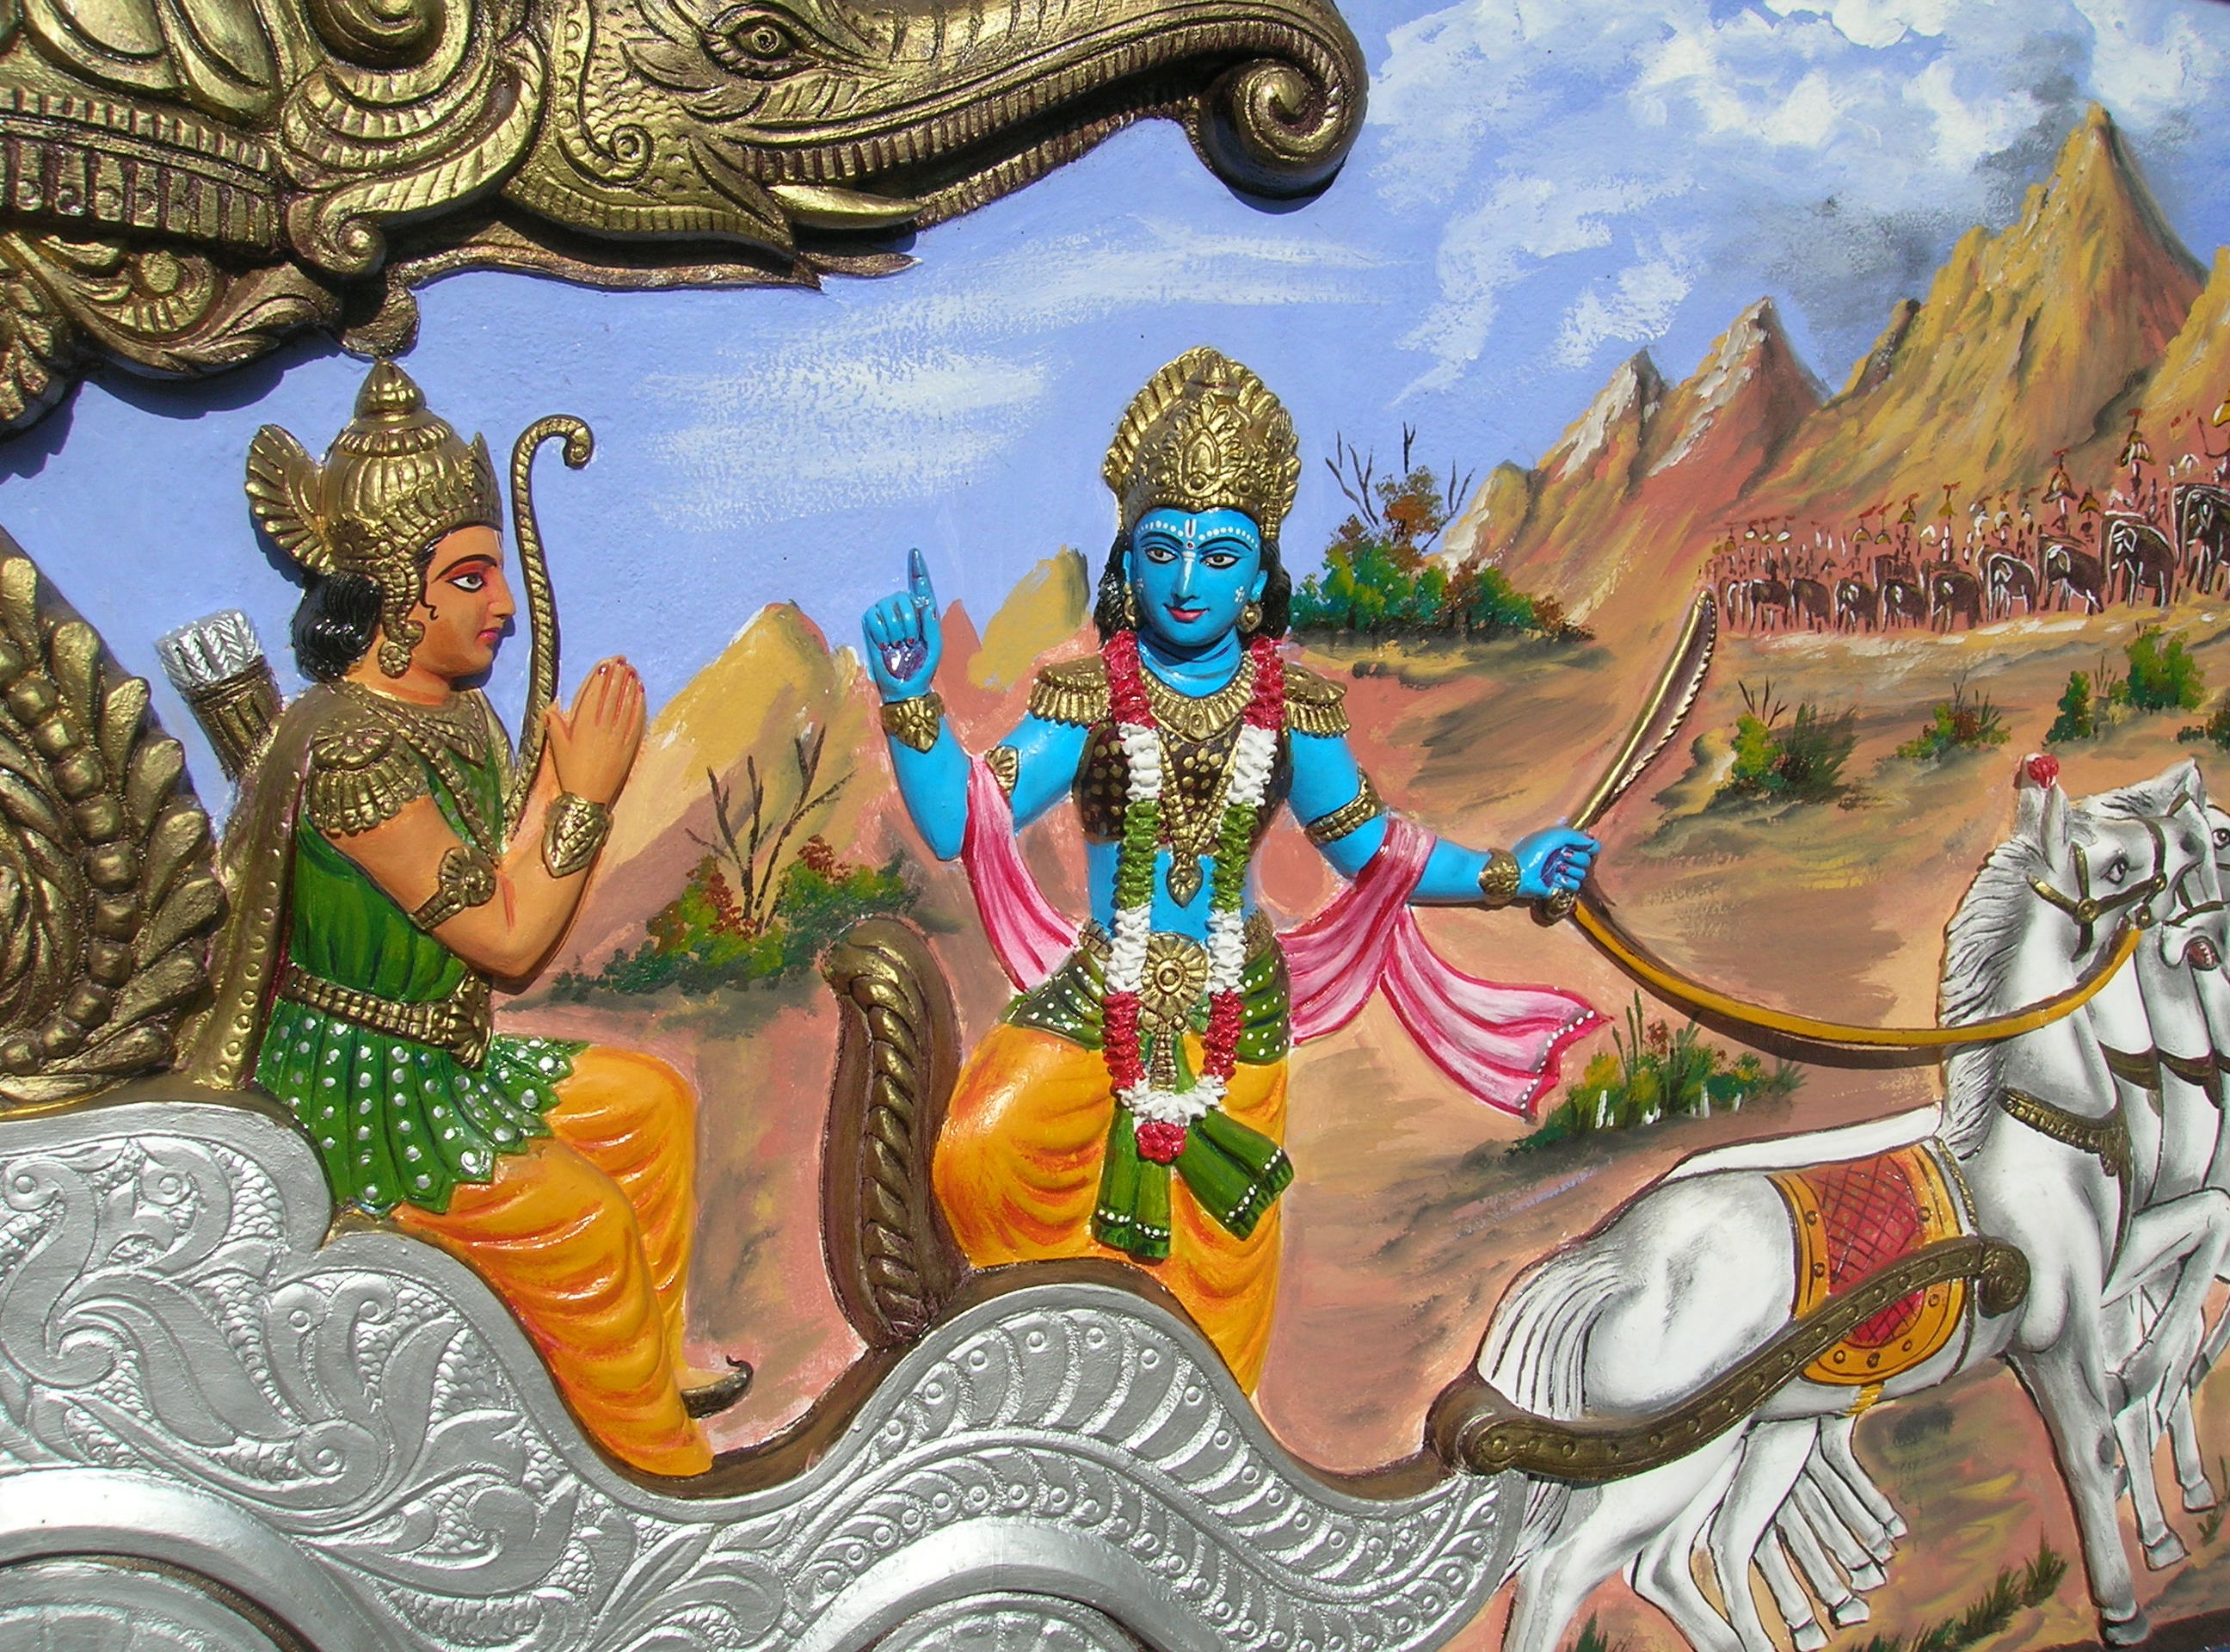 Bhagwad Gita Row – Unnecessary Controversy Over Baseless Claim